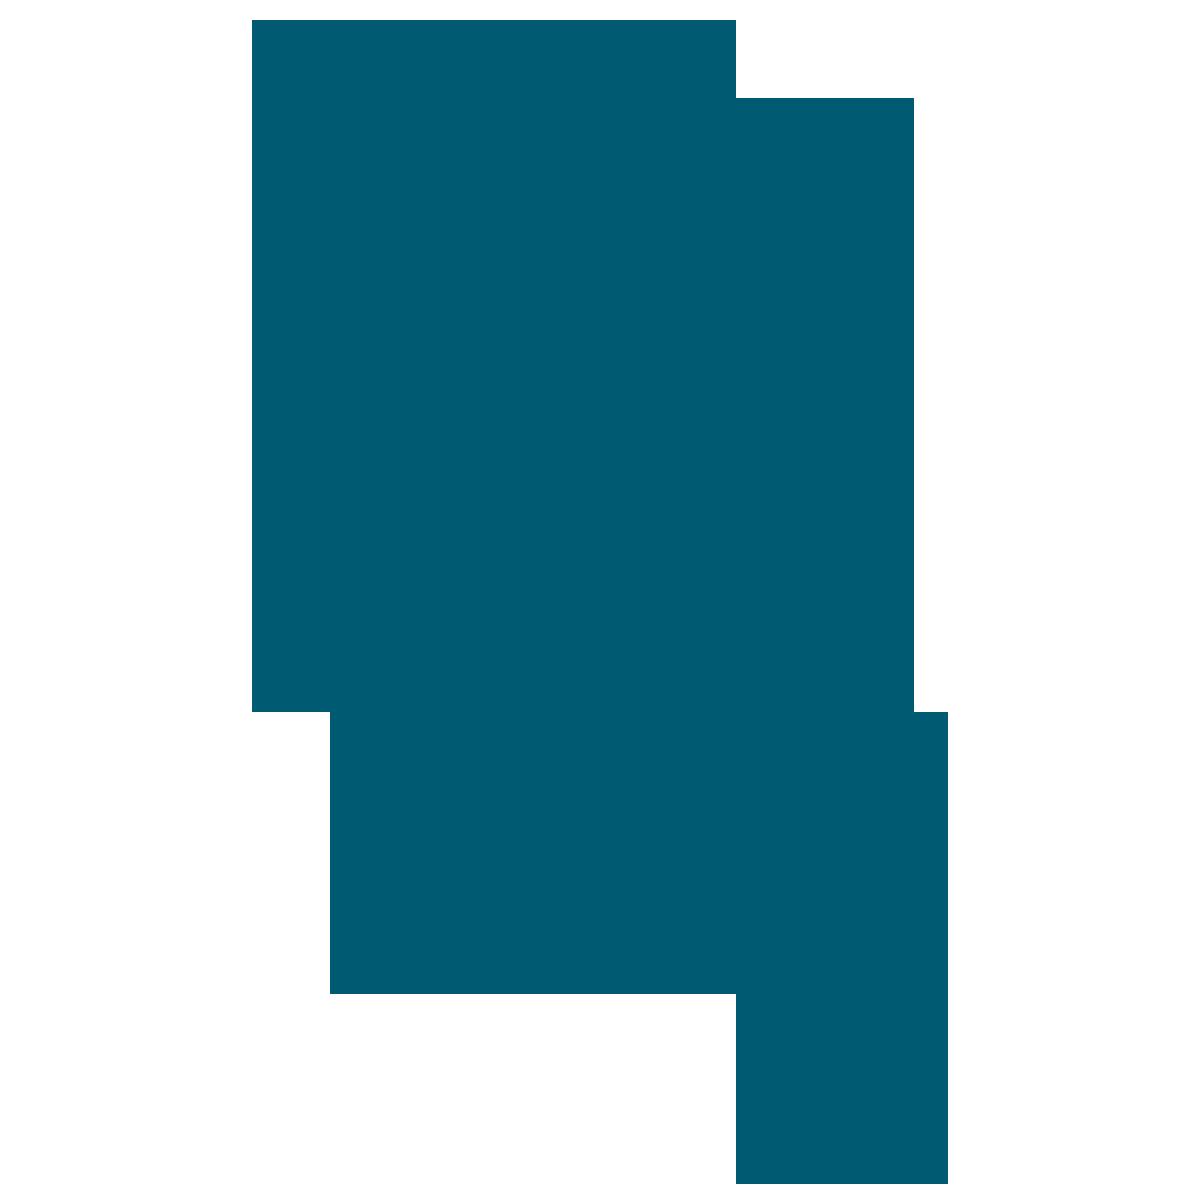 FactSpace West Africa